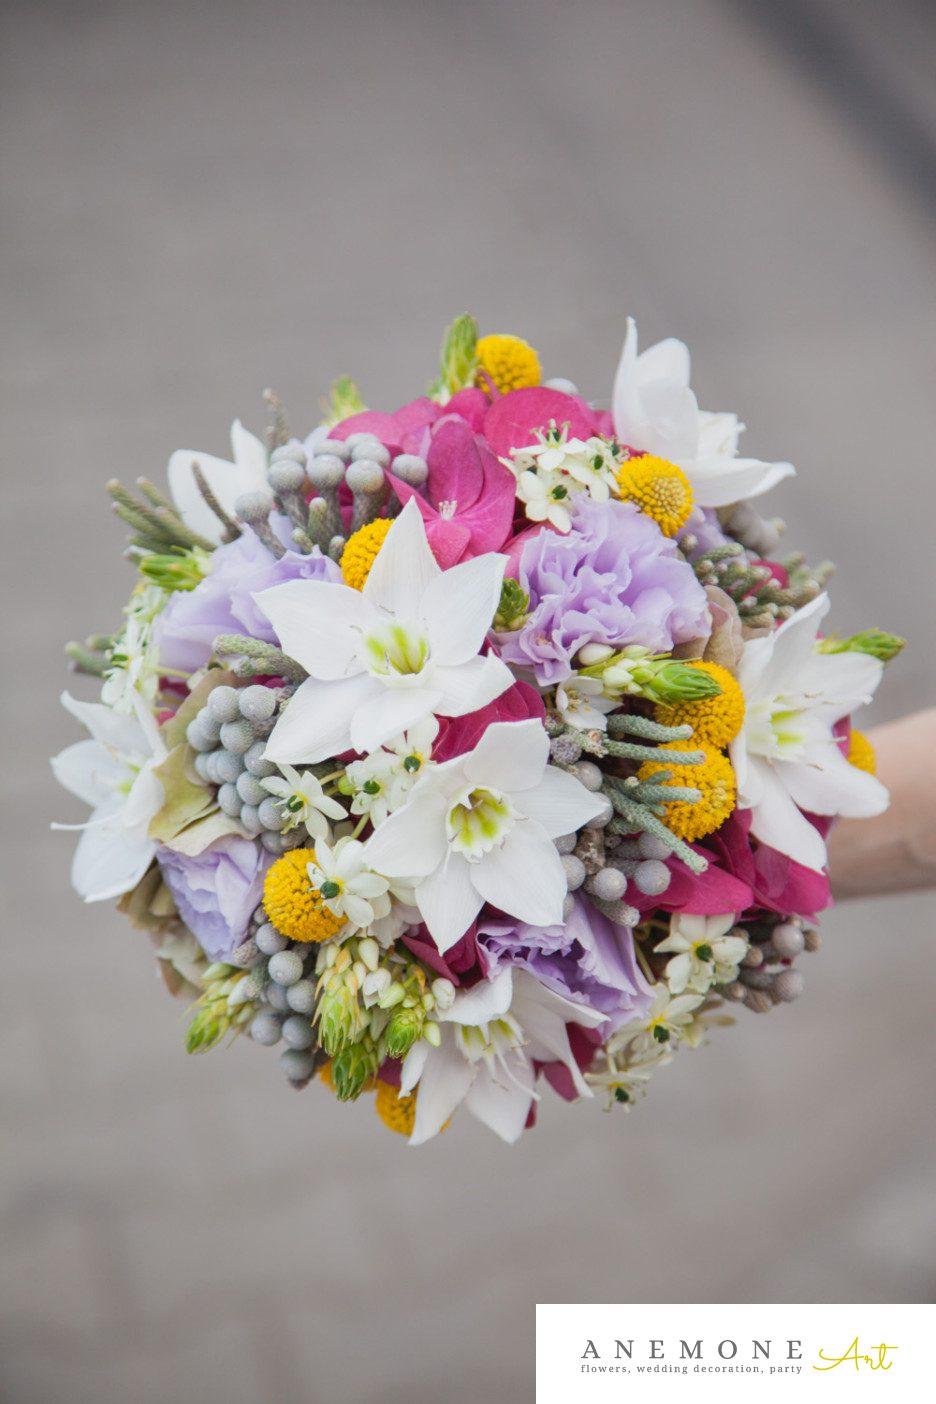 Poza, foto cu Flori de nunta brunia, buchet mireasa, craspedia, eucharis, multicolor, ornitogallum in Arad, Timisoara, Oradea (wedding flowers, bouquets) nunta Arad, Timisoara, Oradea